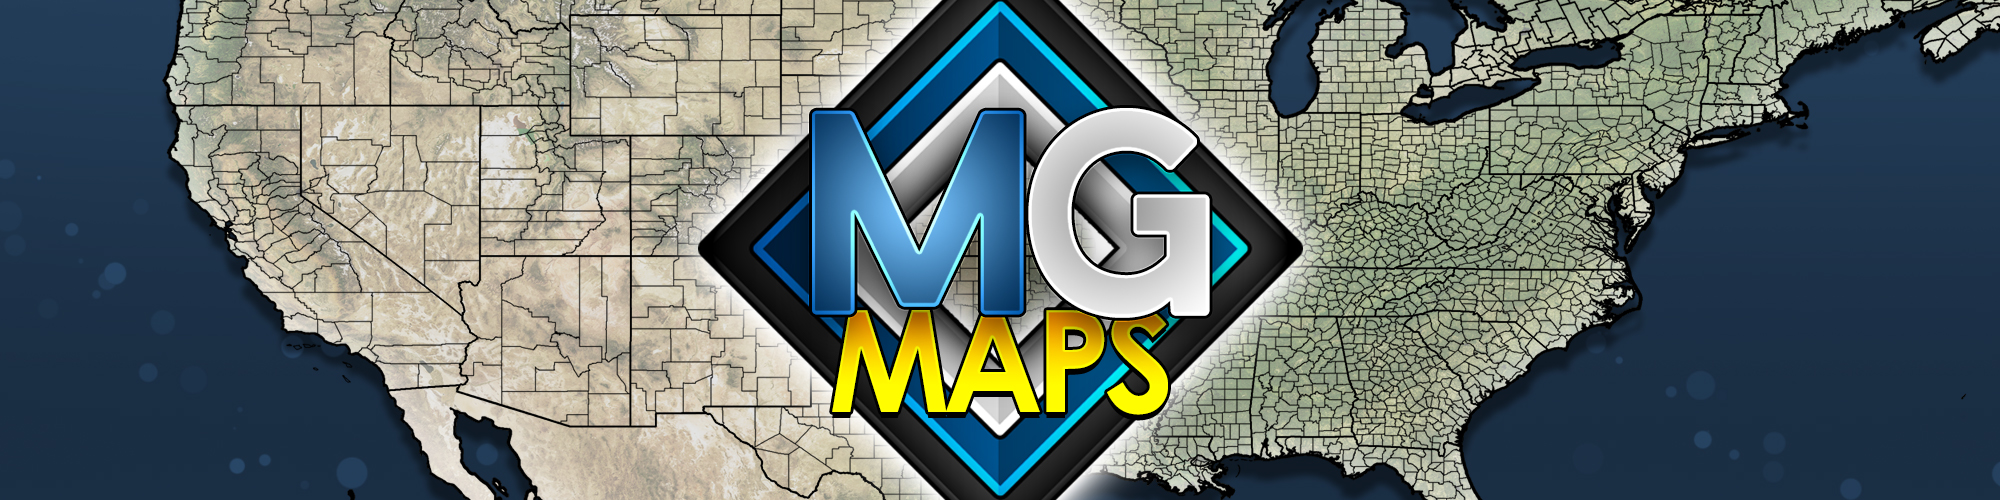 Introducing MG Maps & MetSymbol Kit